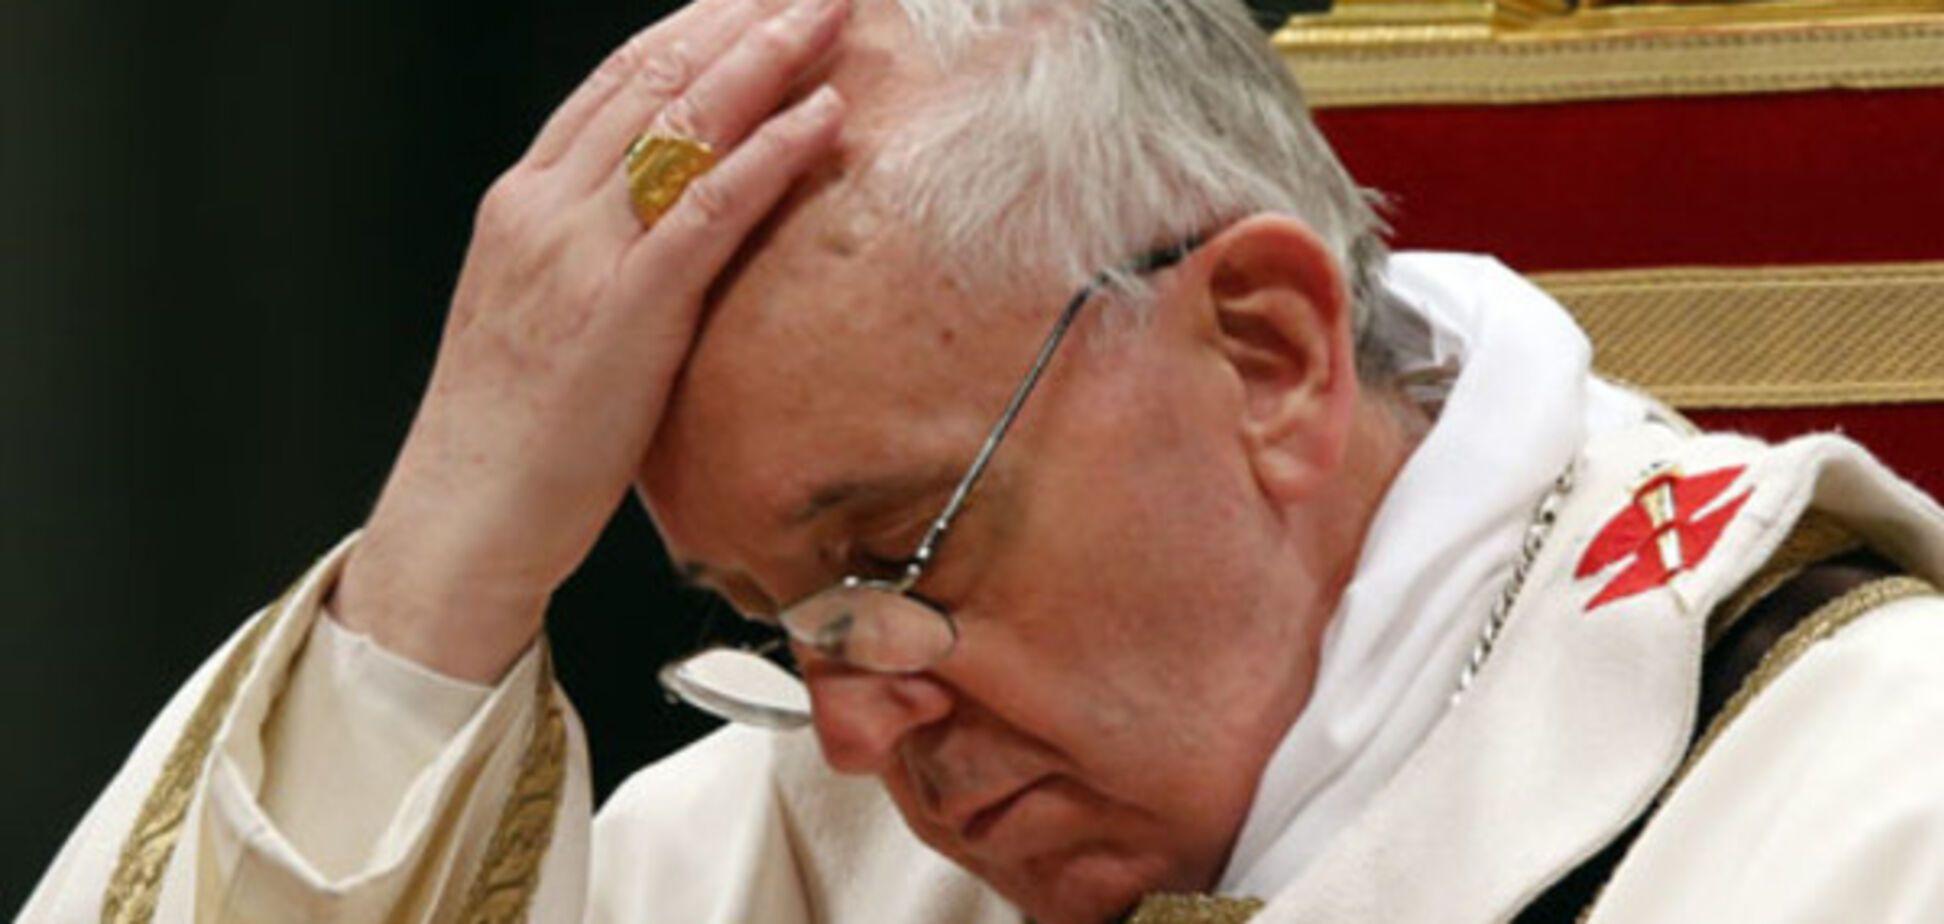 Папа Римский по-запорожски (ФОТО)